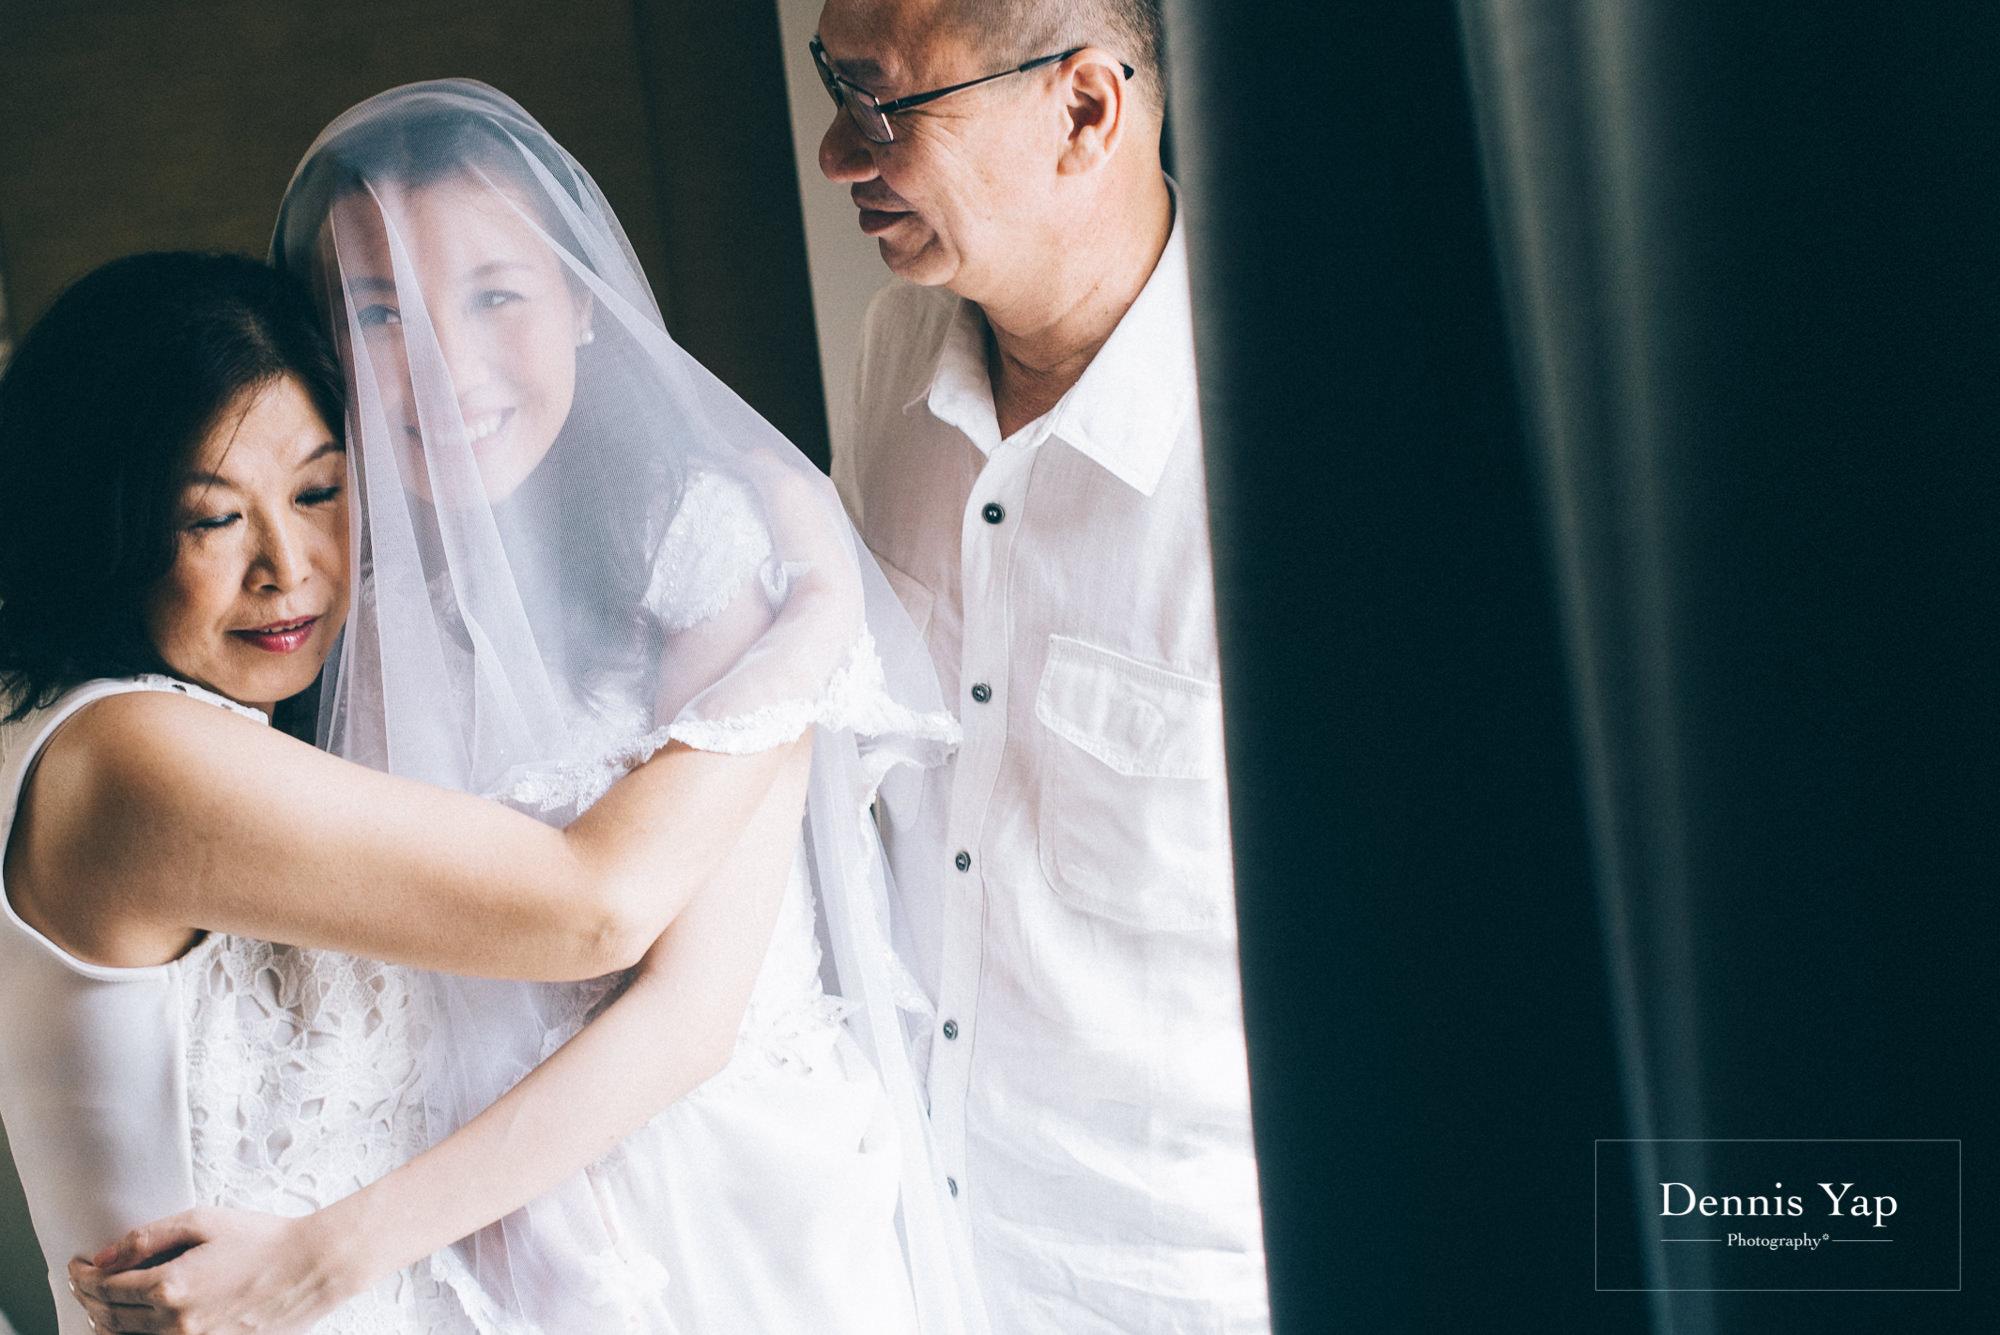 danny sherine wedding reception registration of marriage yacht fun beloved sea dennis yap photography malaysia top wedding photographer-13.jpg